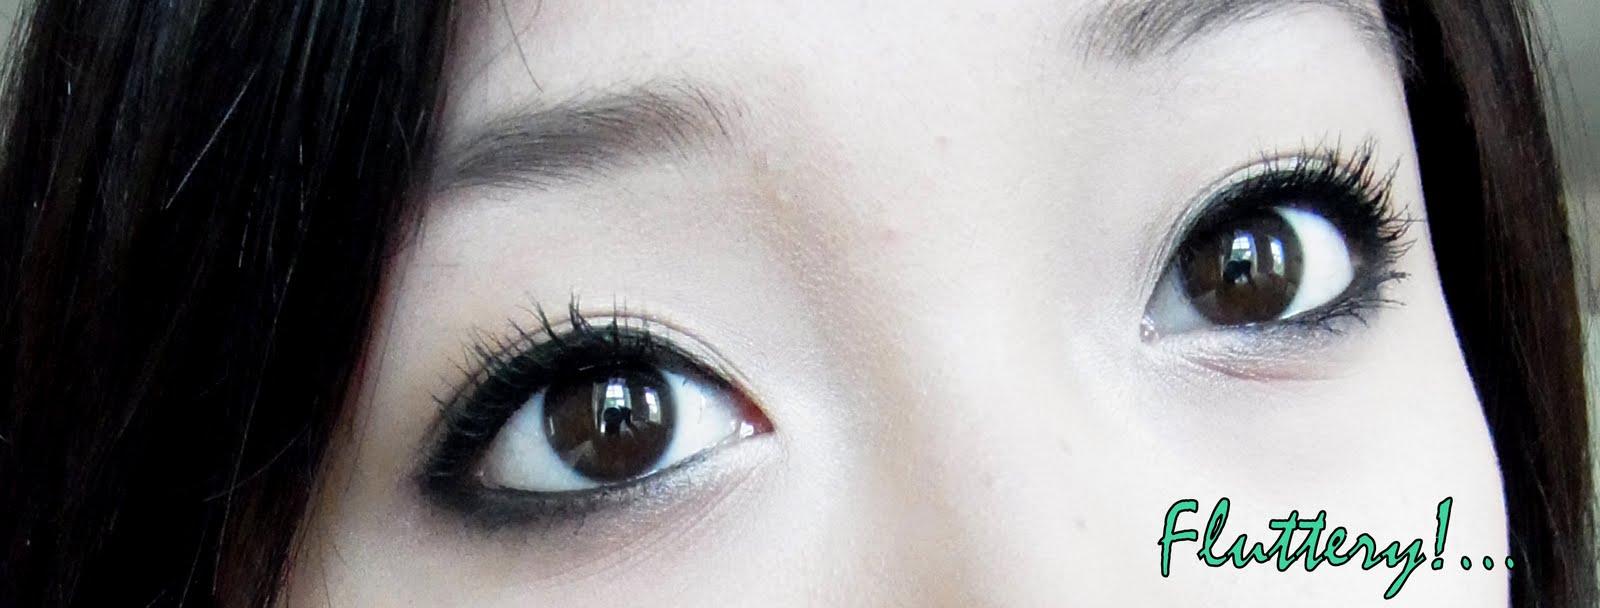 Miich I Ful Koji Eyelash Curler Review